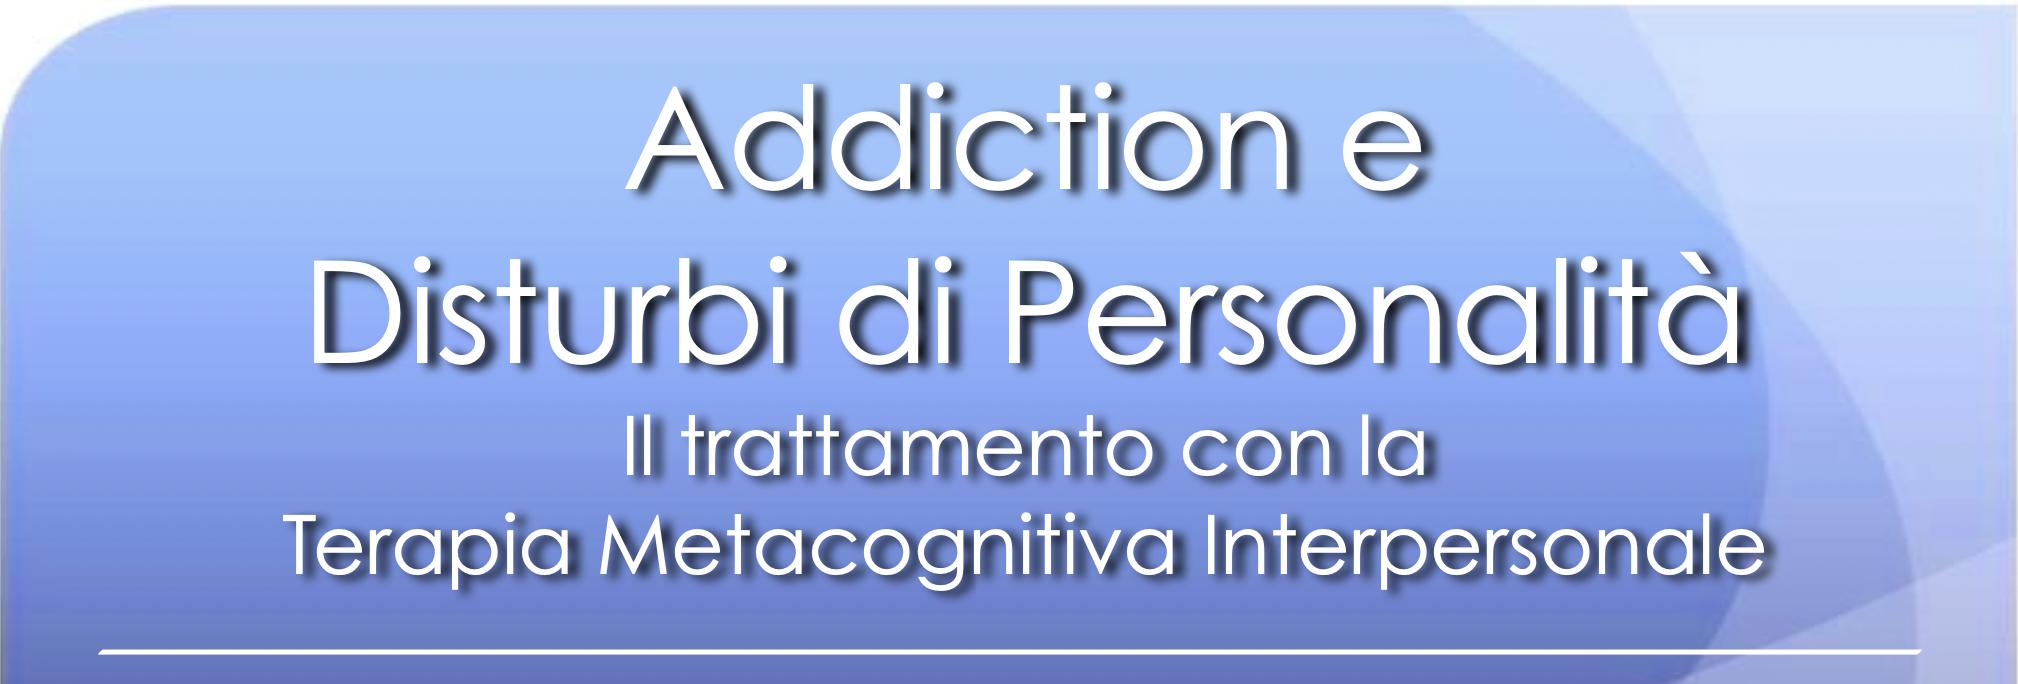 Addiction TMI